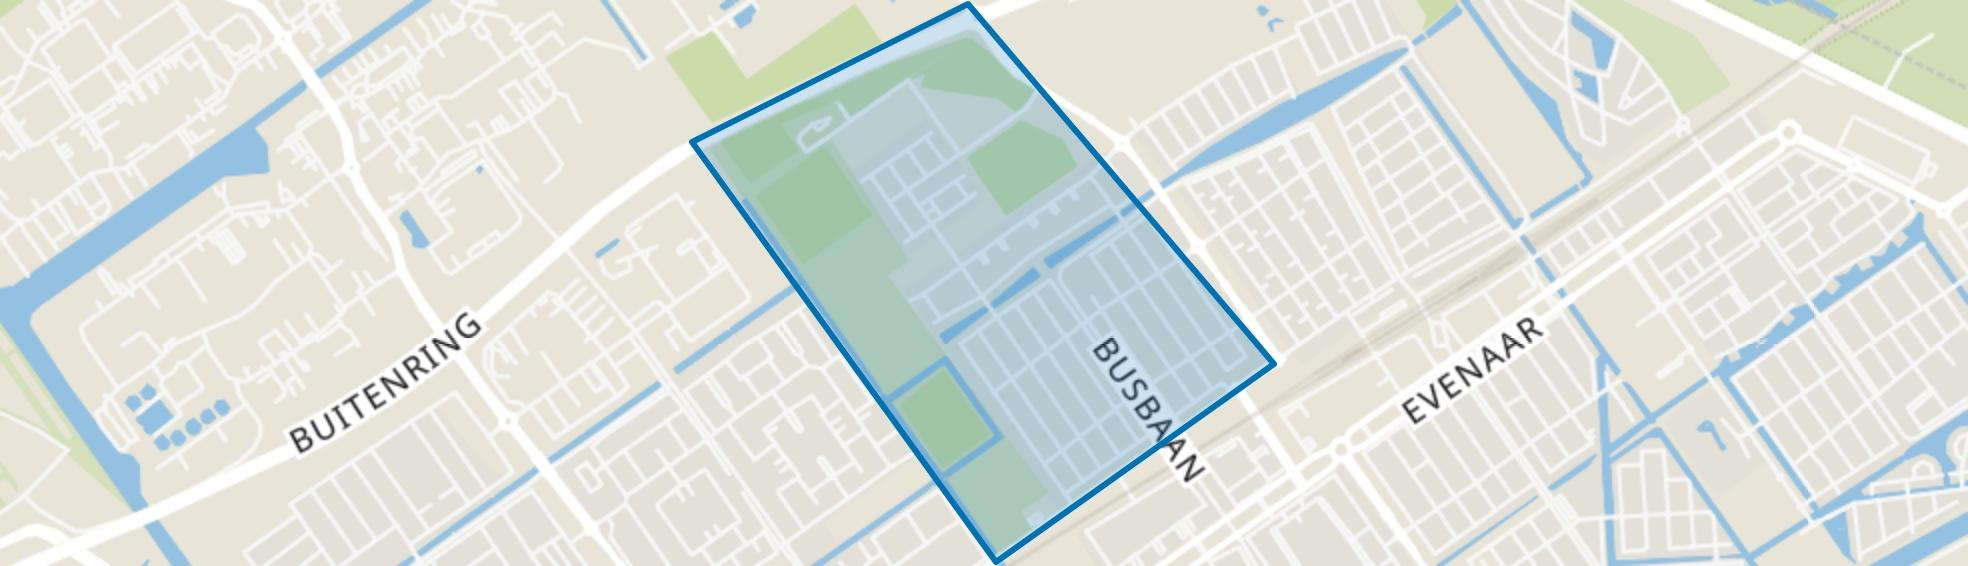 Seizoenenbuurt, Almere map